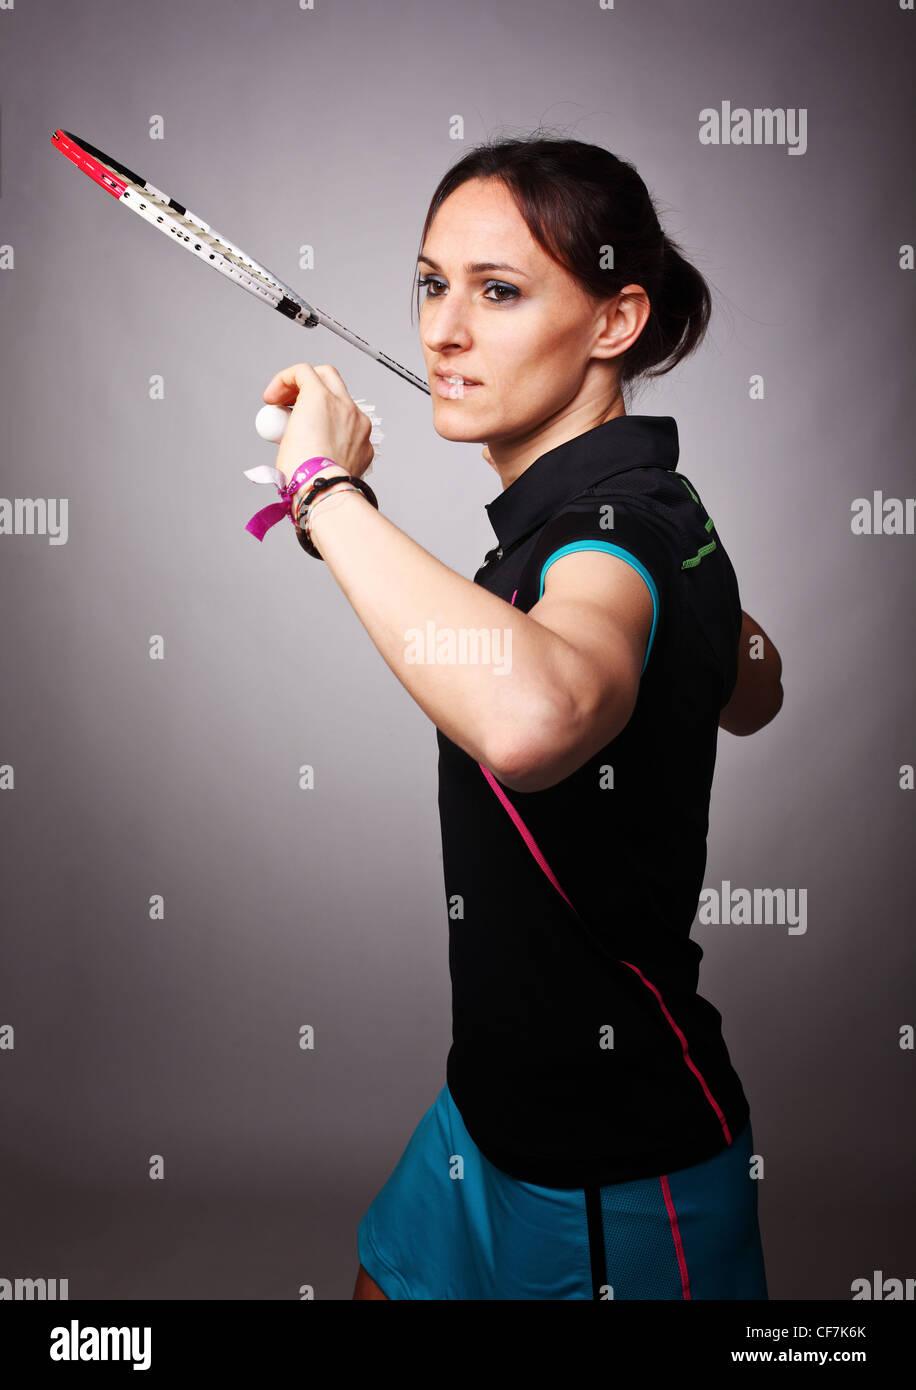 portrait of caucasian woman play badminton - Stock Image